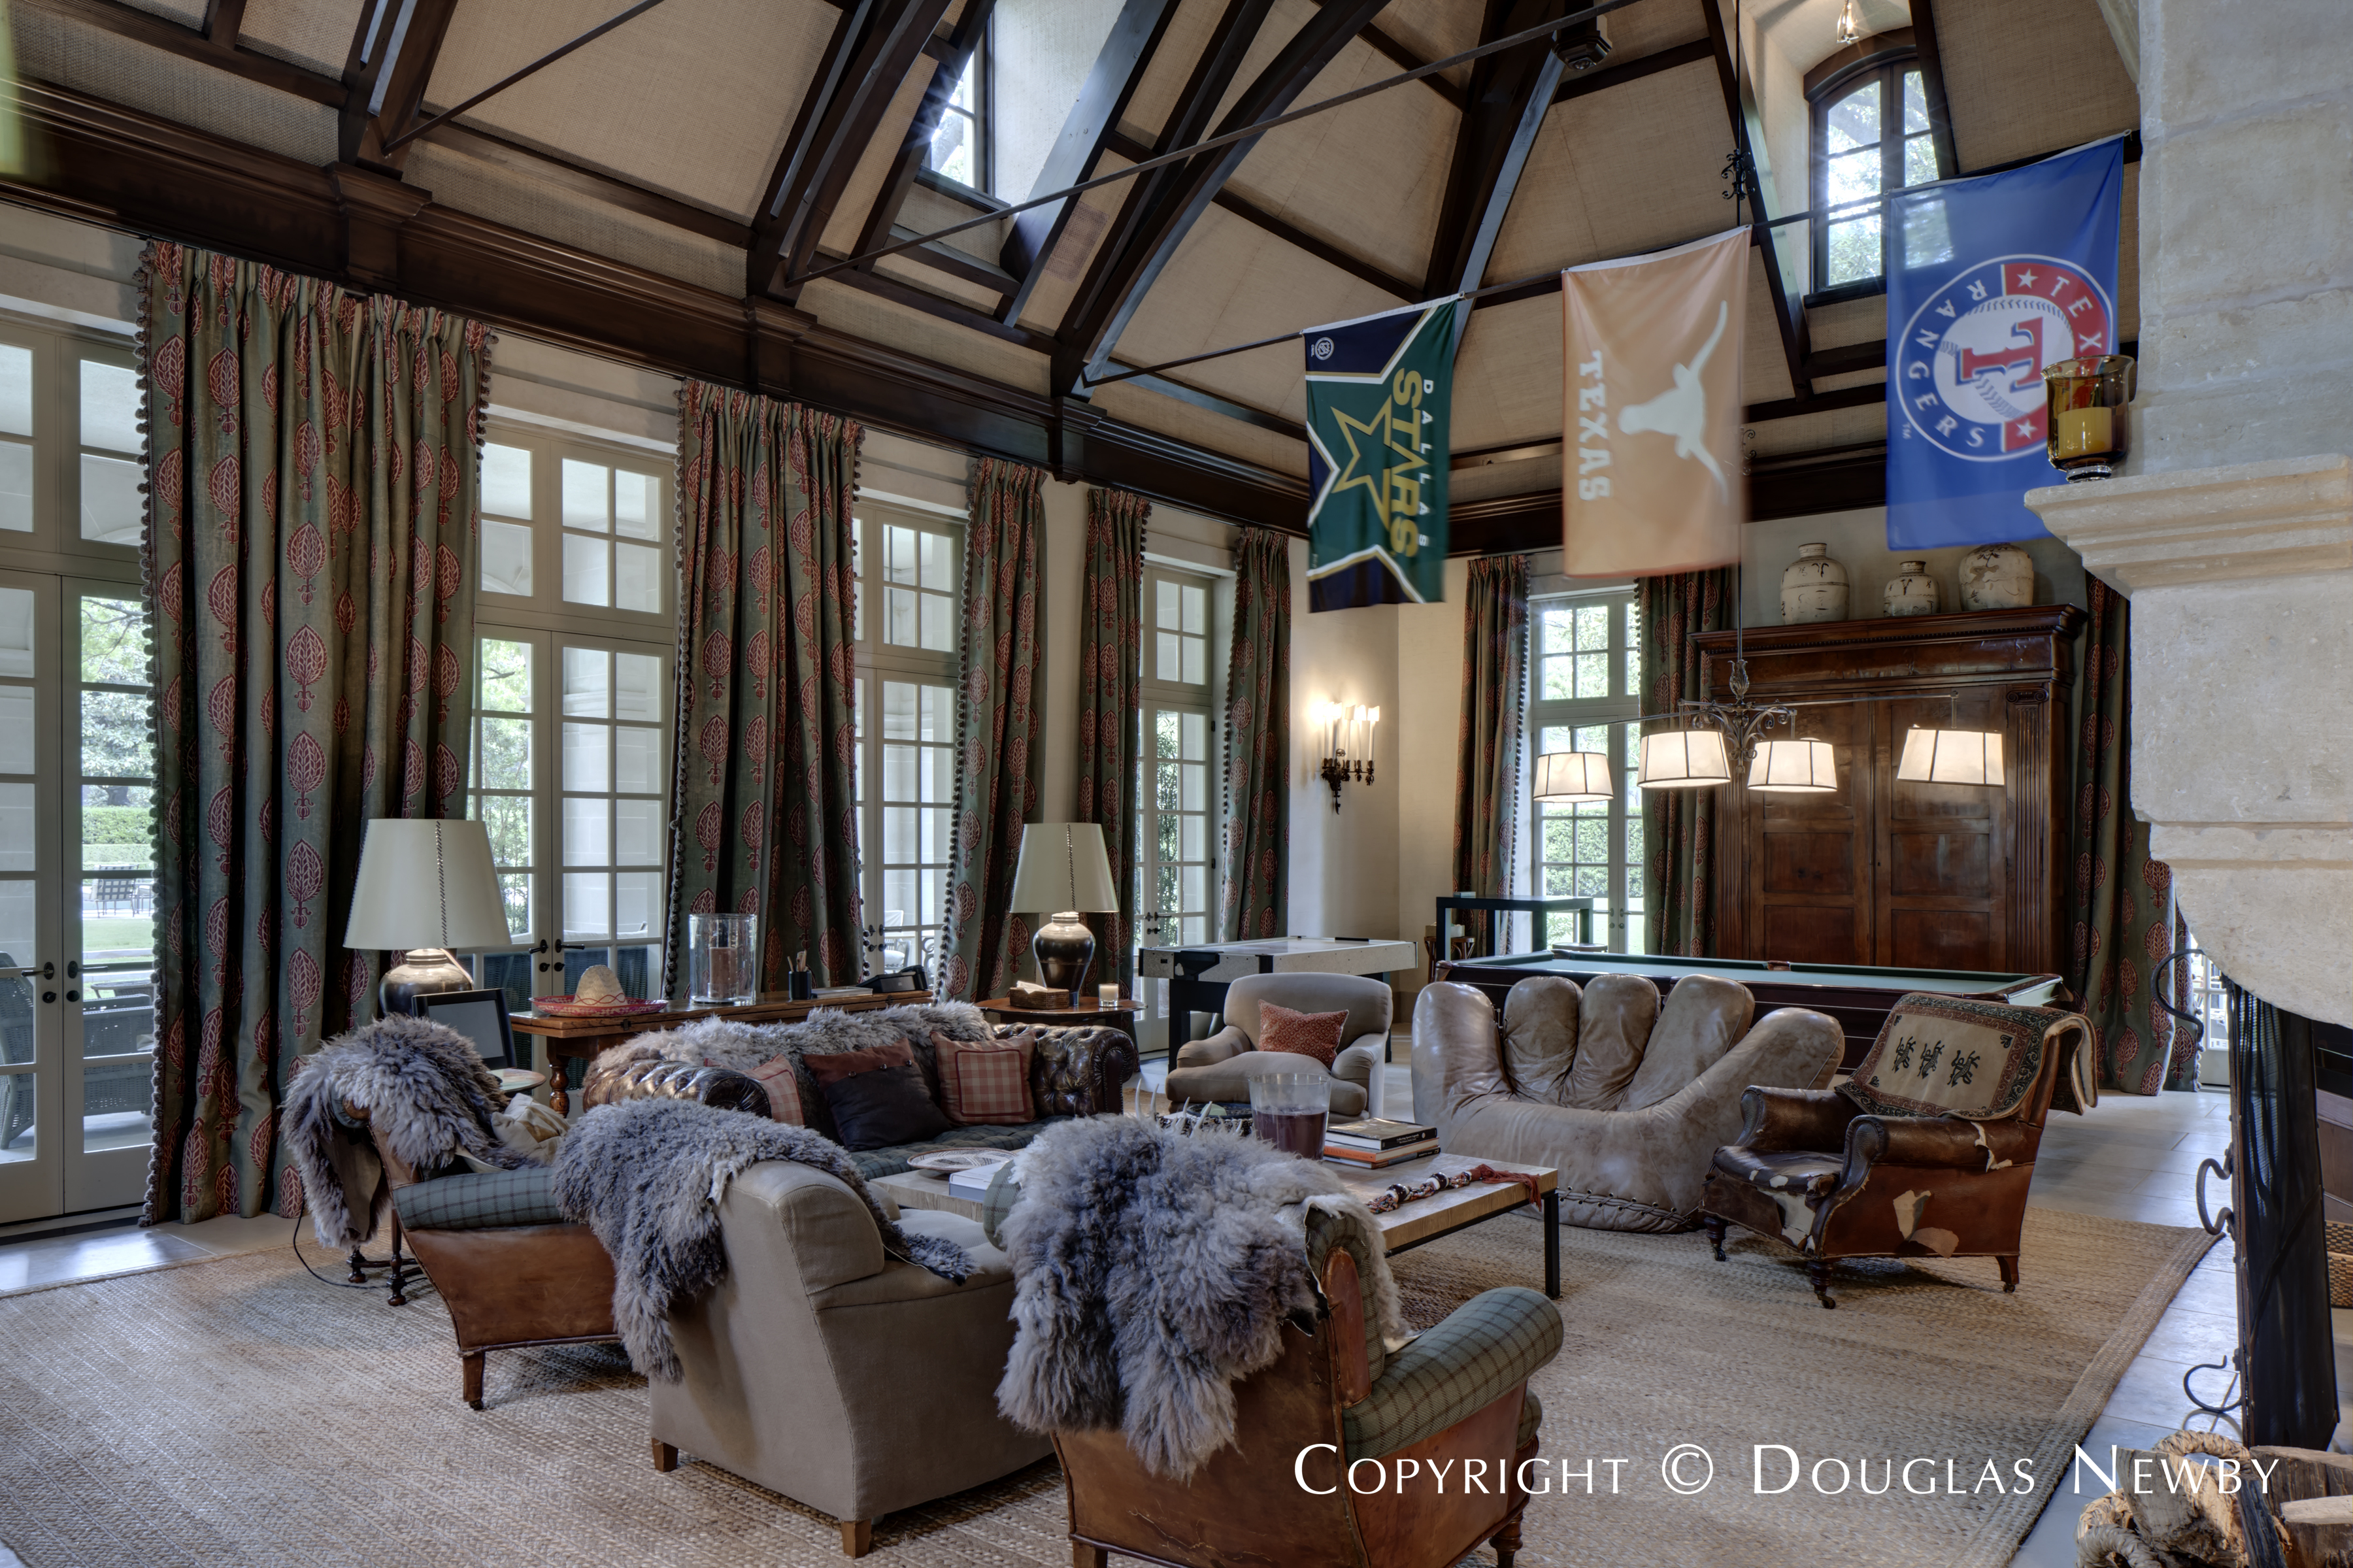 Pool House of Mayflower Estates Property